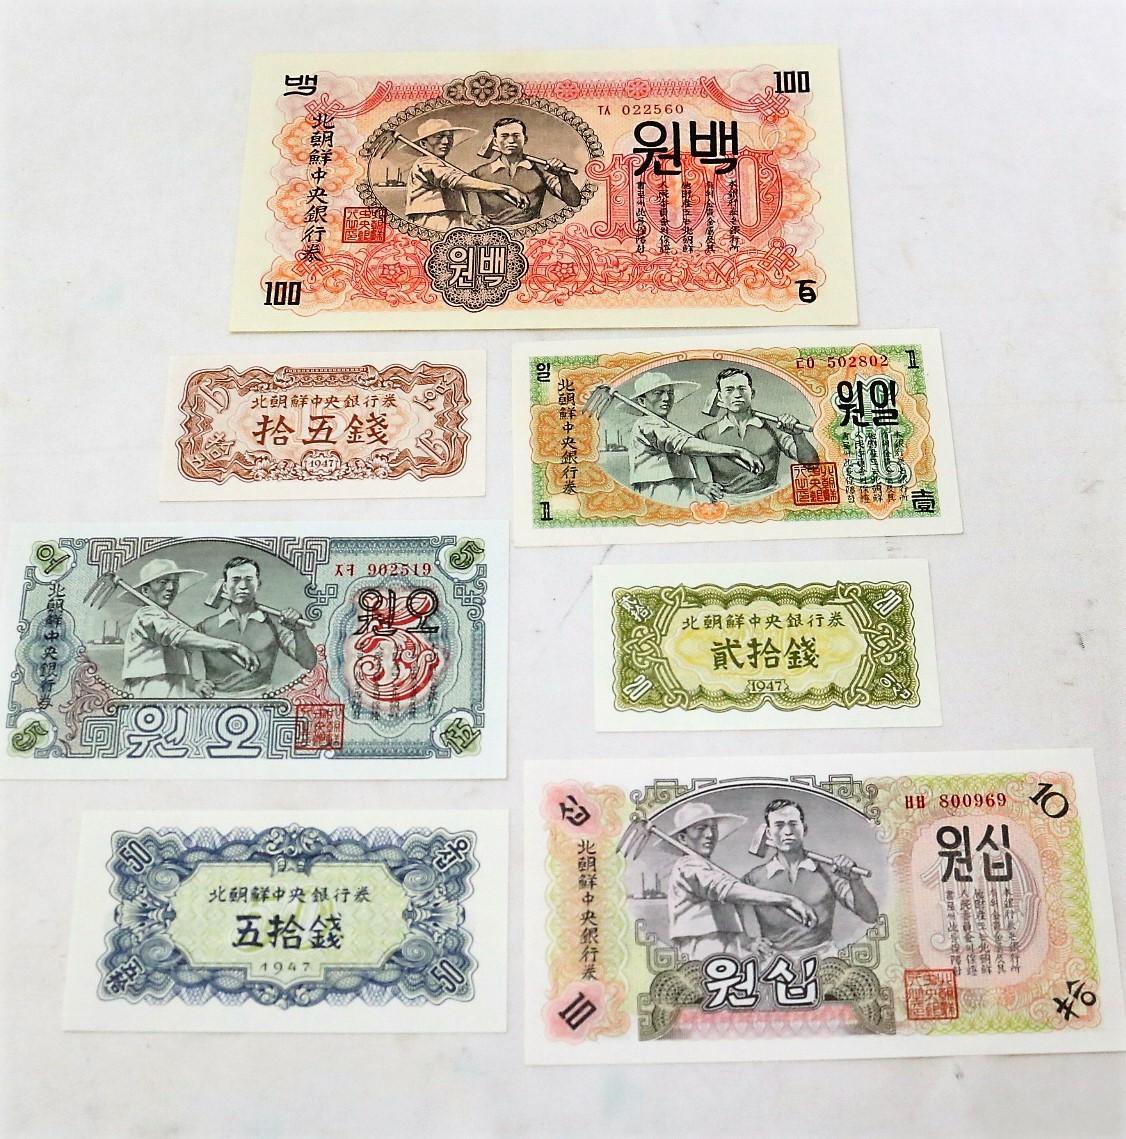 63HVM ★ 北韓 紙幣 1974年 外国紙幣 未使用 50/10/5/100/1/20/15 7枚 NORTH/KOREA OLD/PAPER MONEY ③ ★_画像2